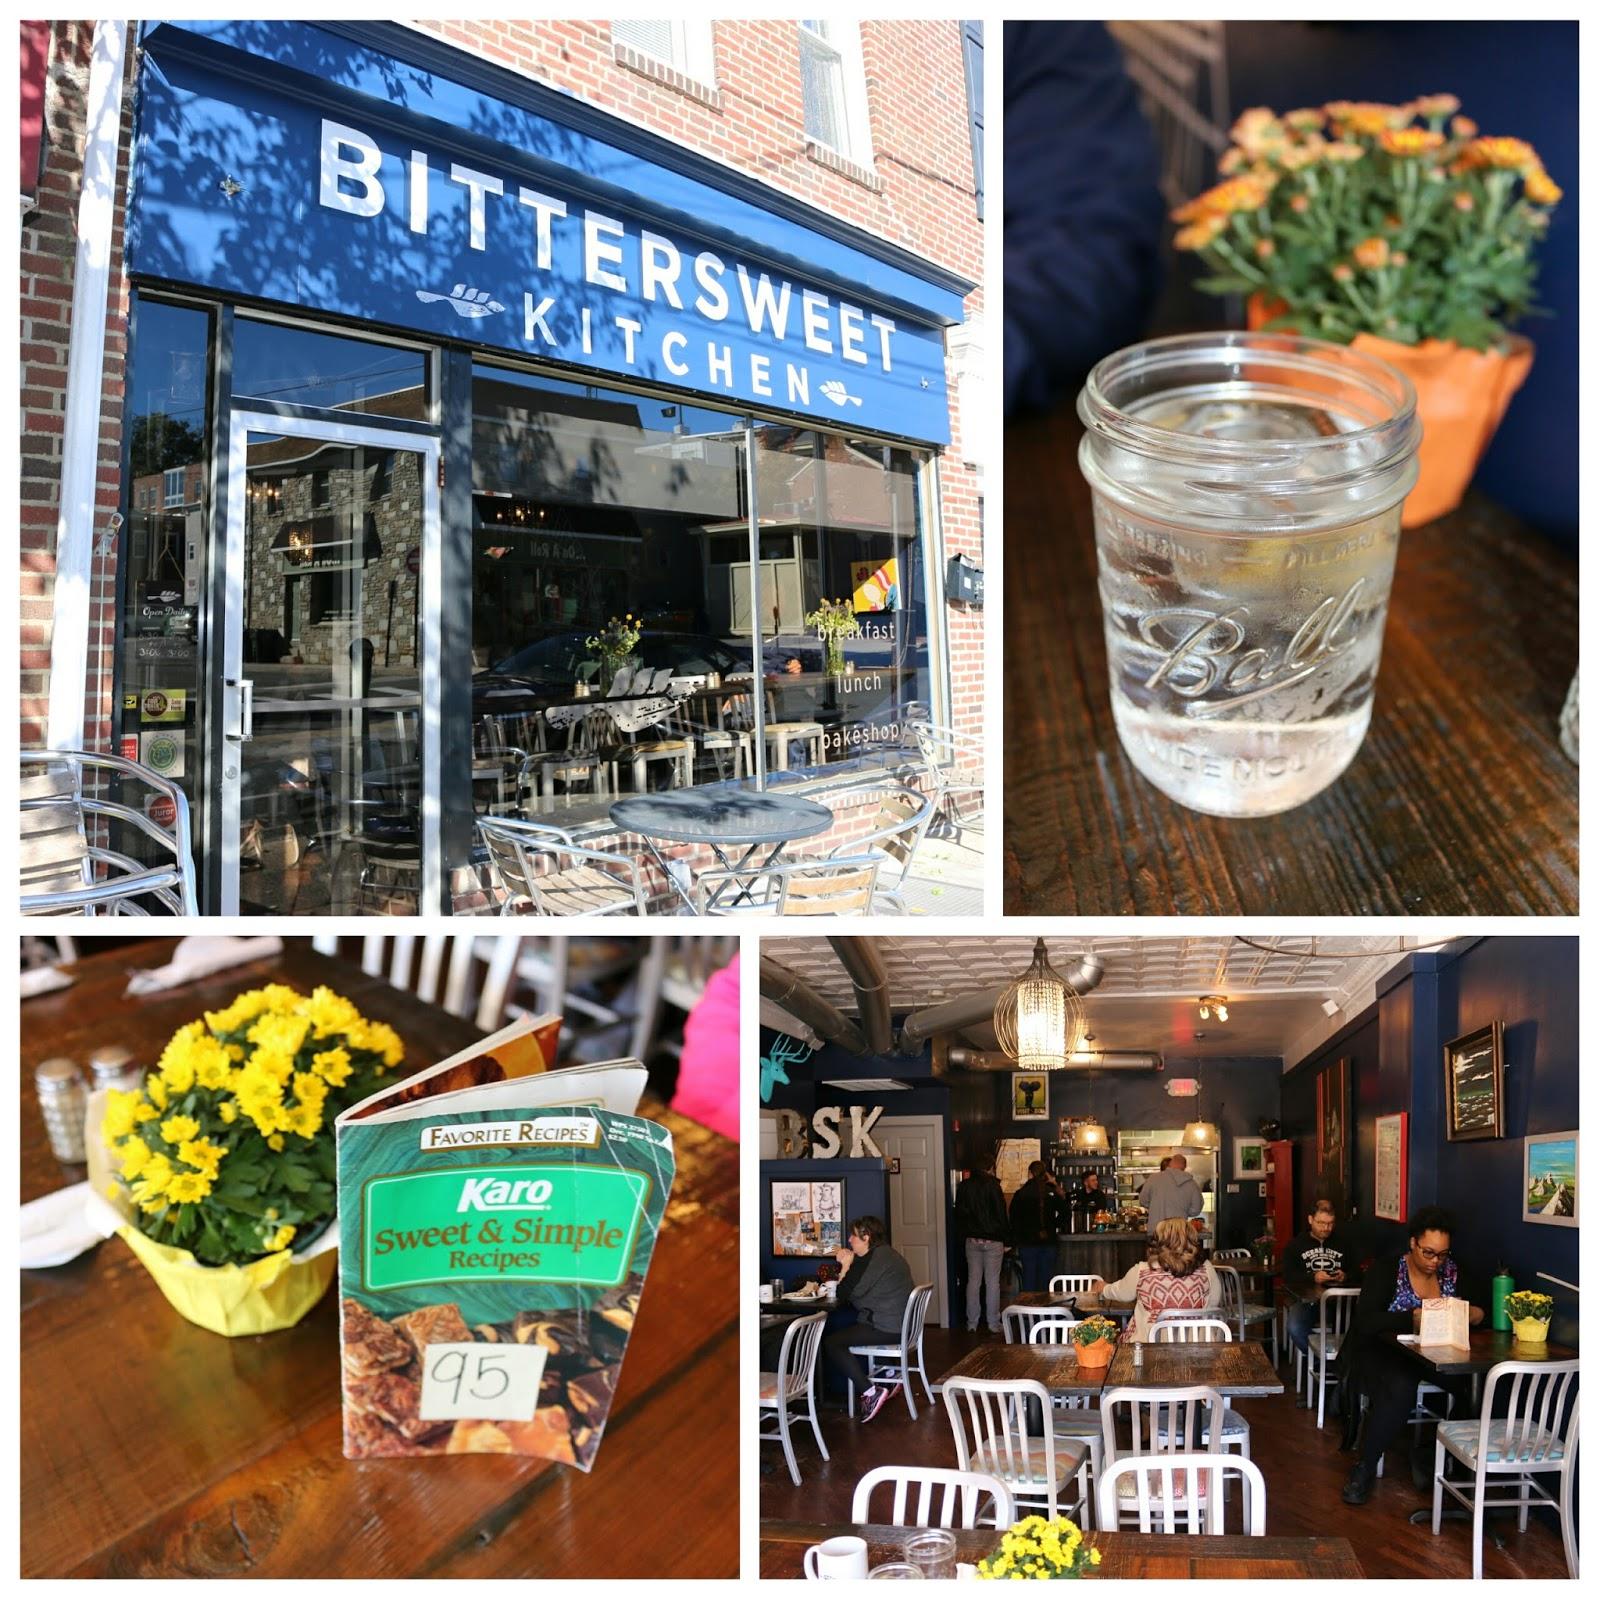 Bittersweet Kitchen Quaint Brunch Spot Right Picturesque Media